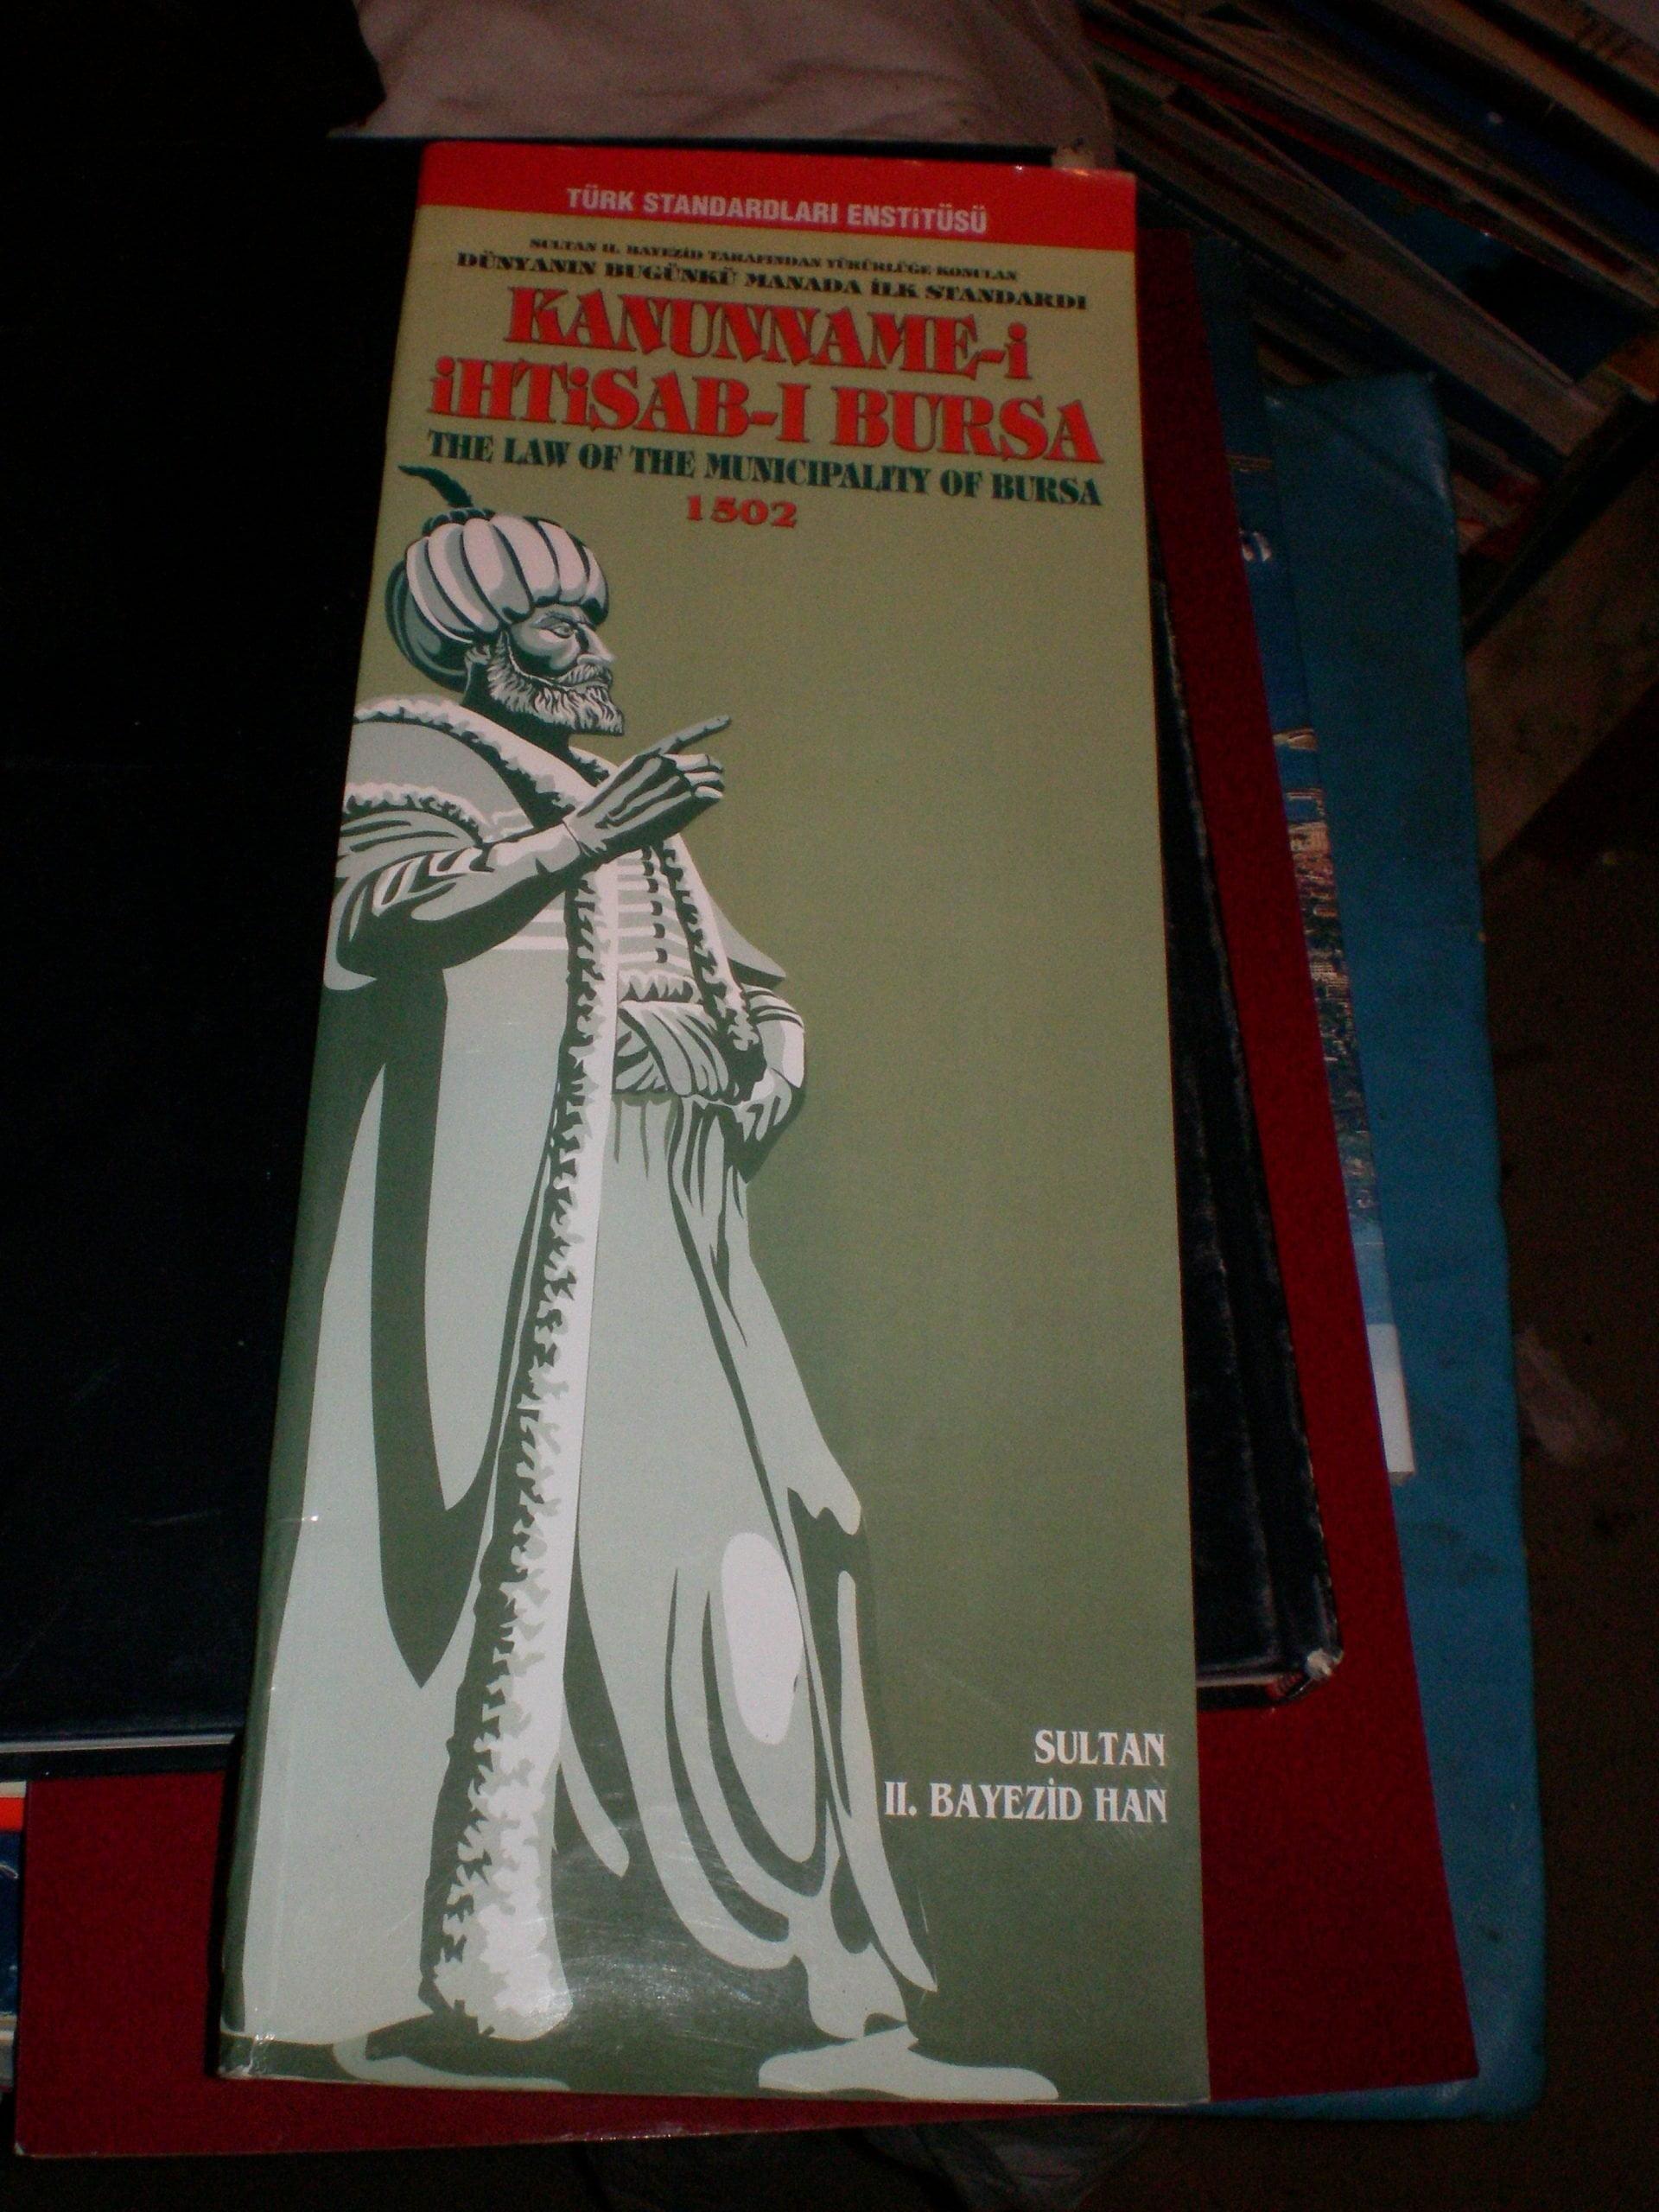 KANUNNAME-İ İHTİSAB-I BURSA 1502/TIPKI BASIM/TSE/ 15 tl